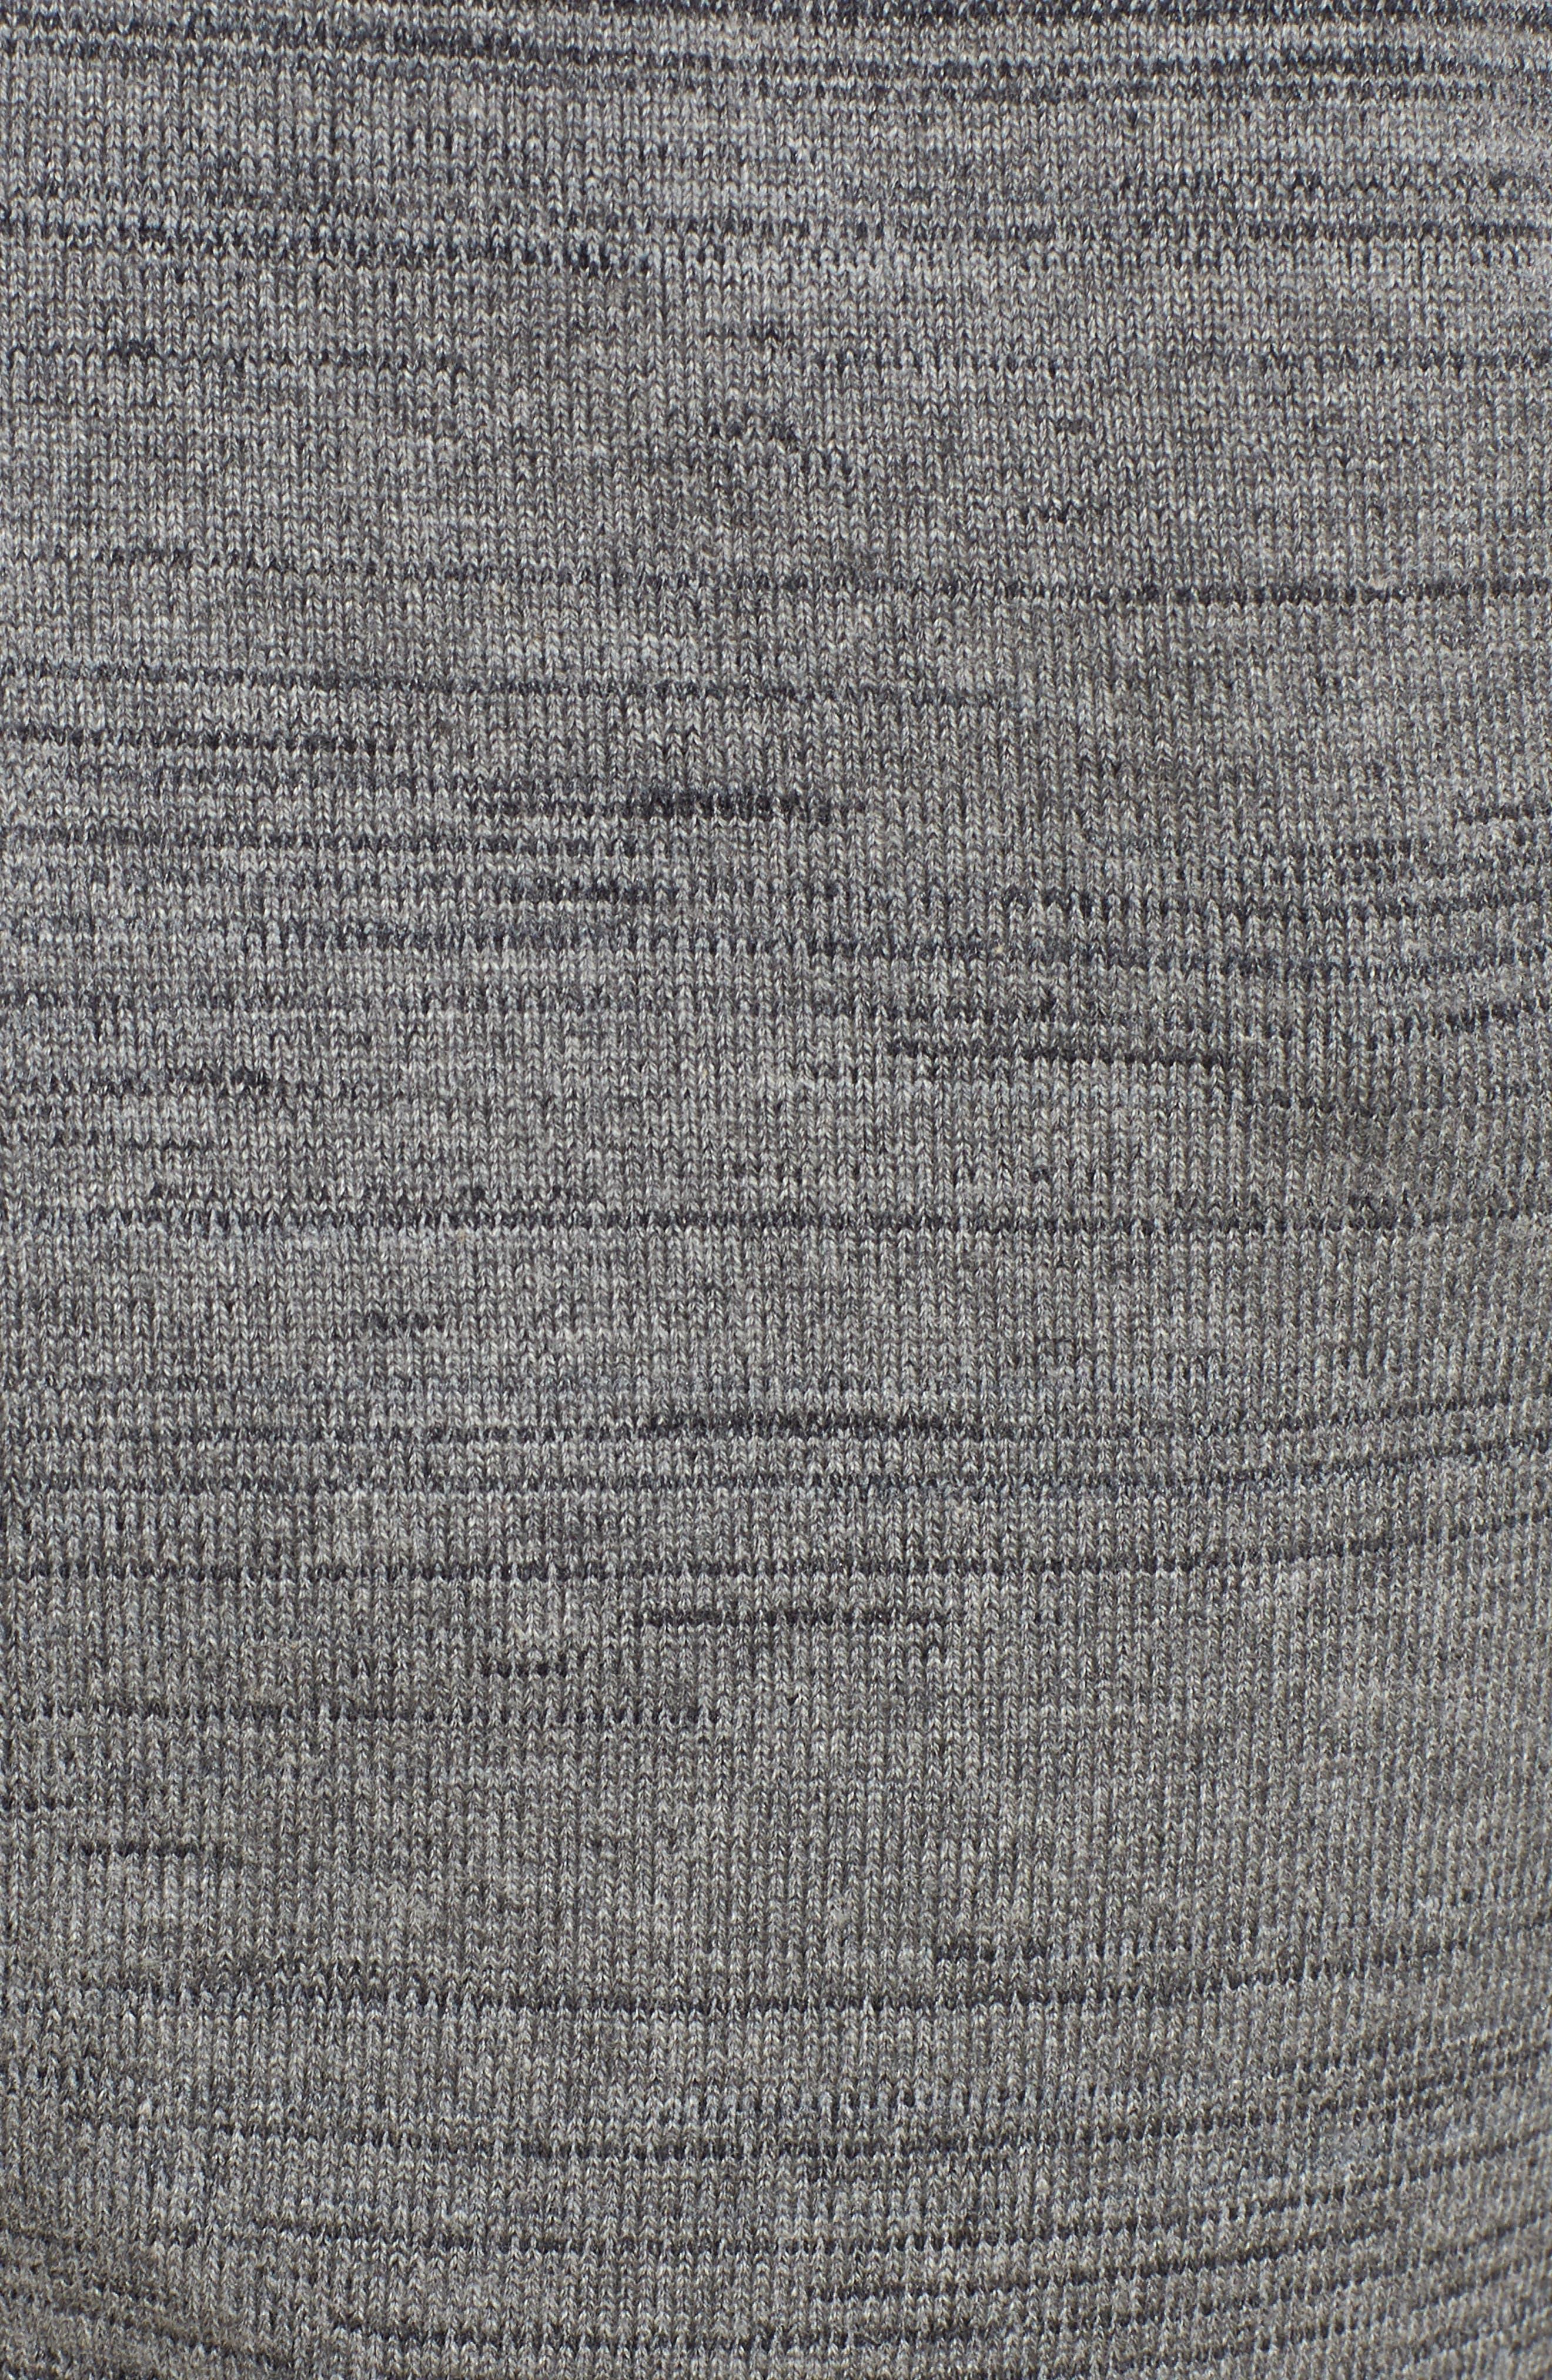 Tech Shorts,                             Alternate thumbnail 5, color,                             030